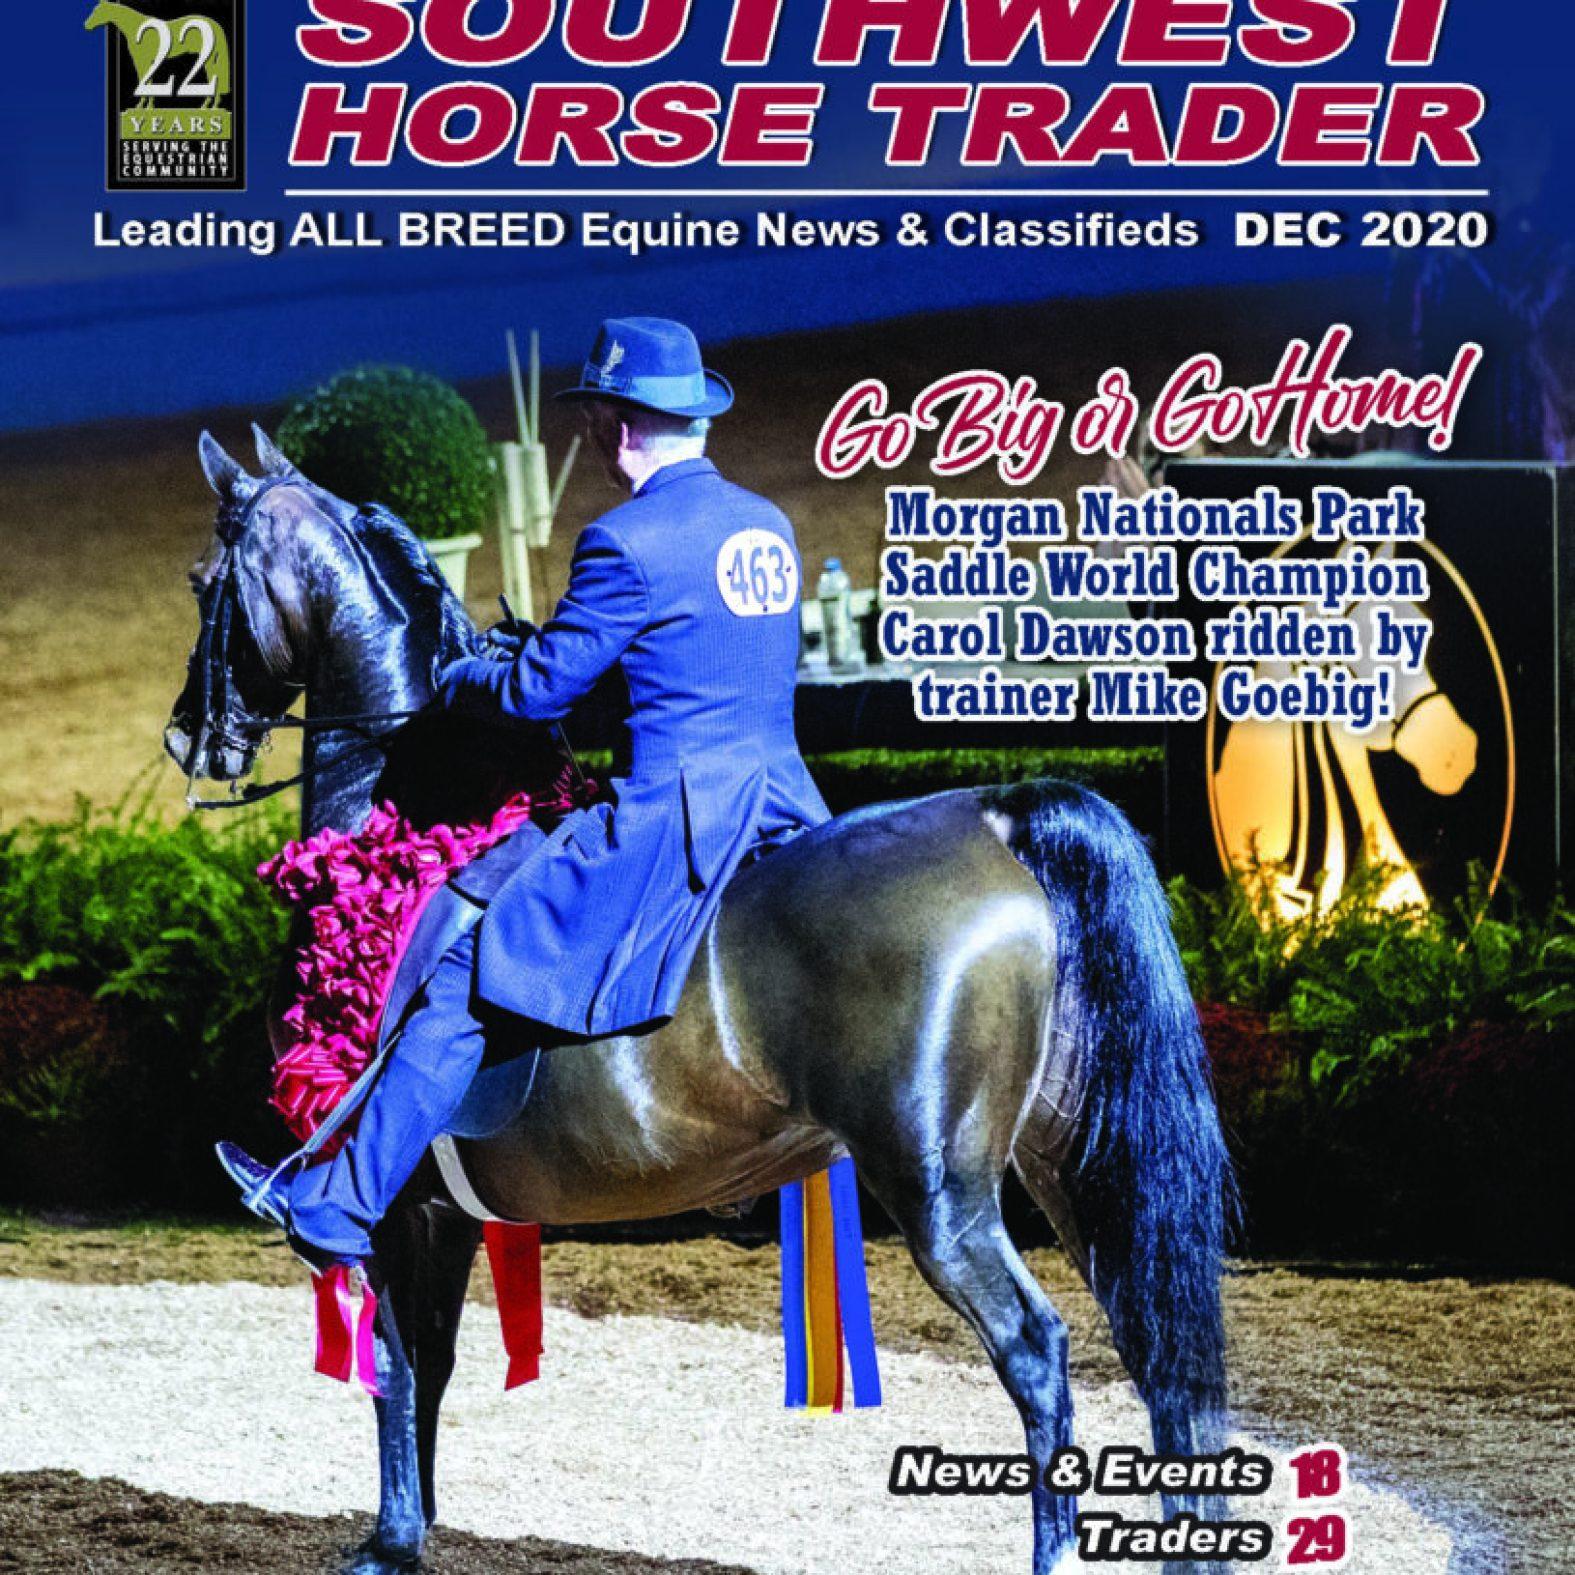 SouthWest Horse Trader December 2020 Issue